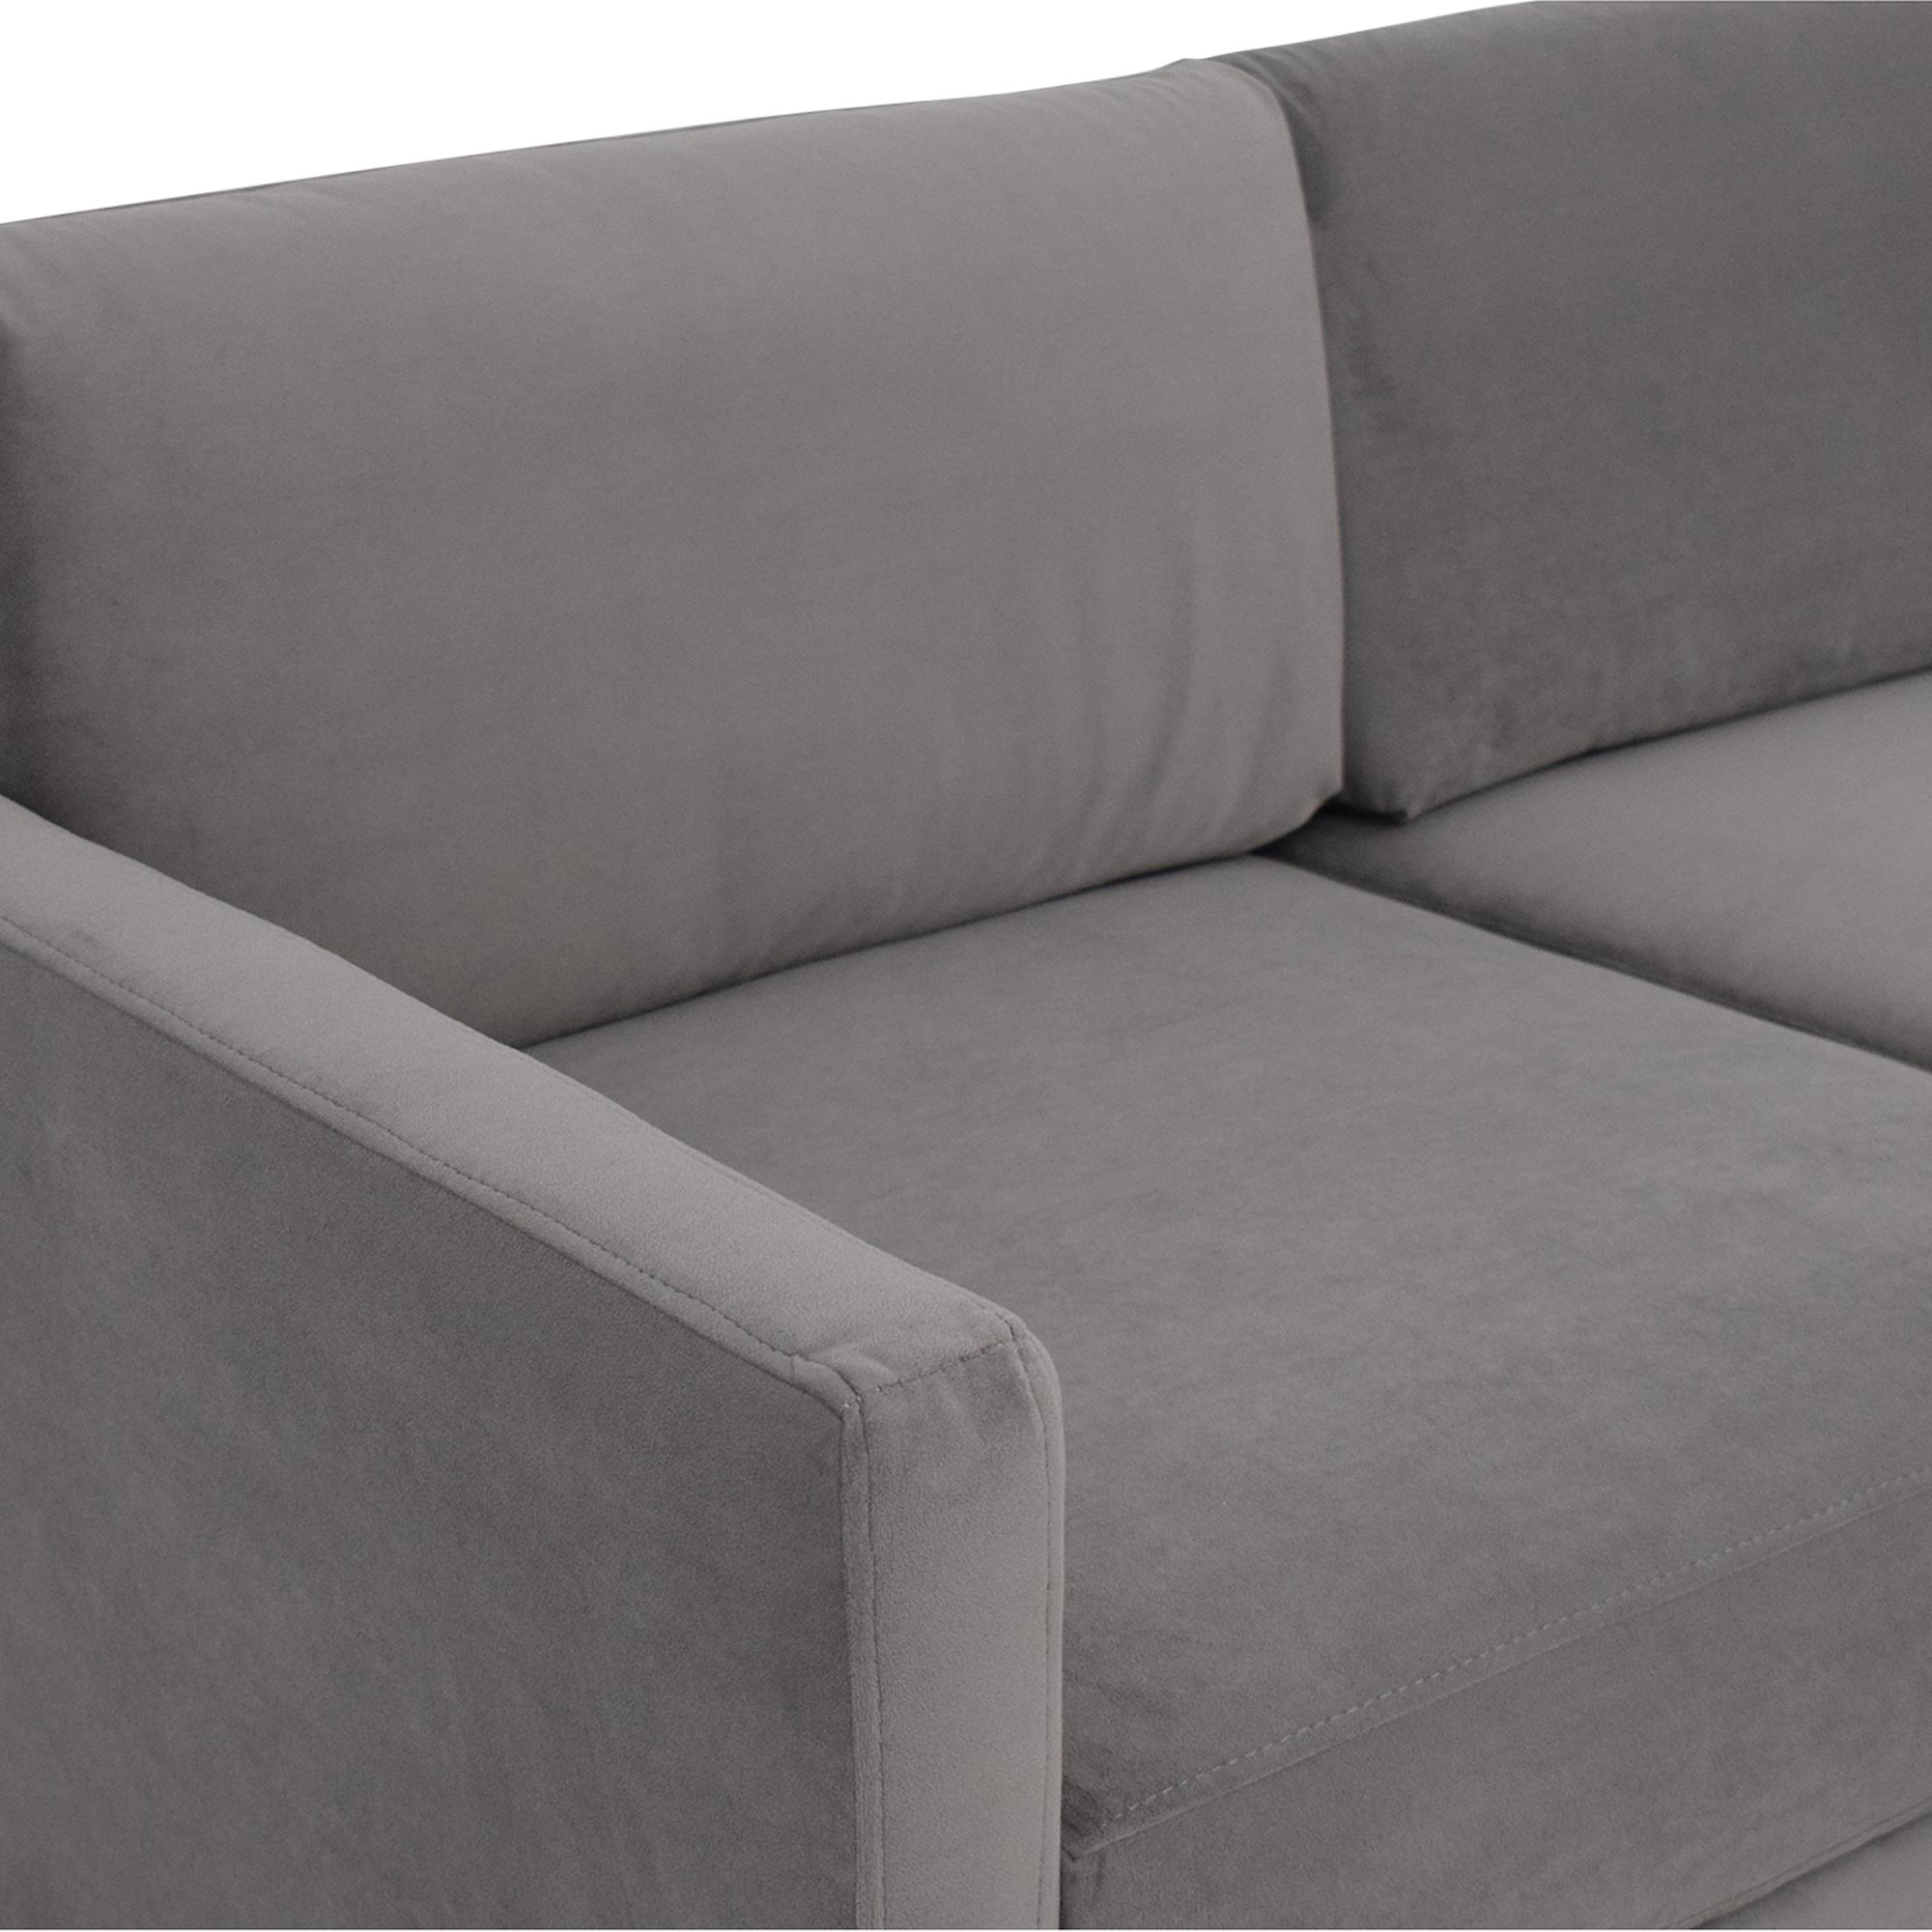 The Inside The Inside Modern Sofa ct